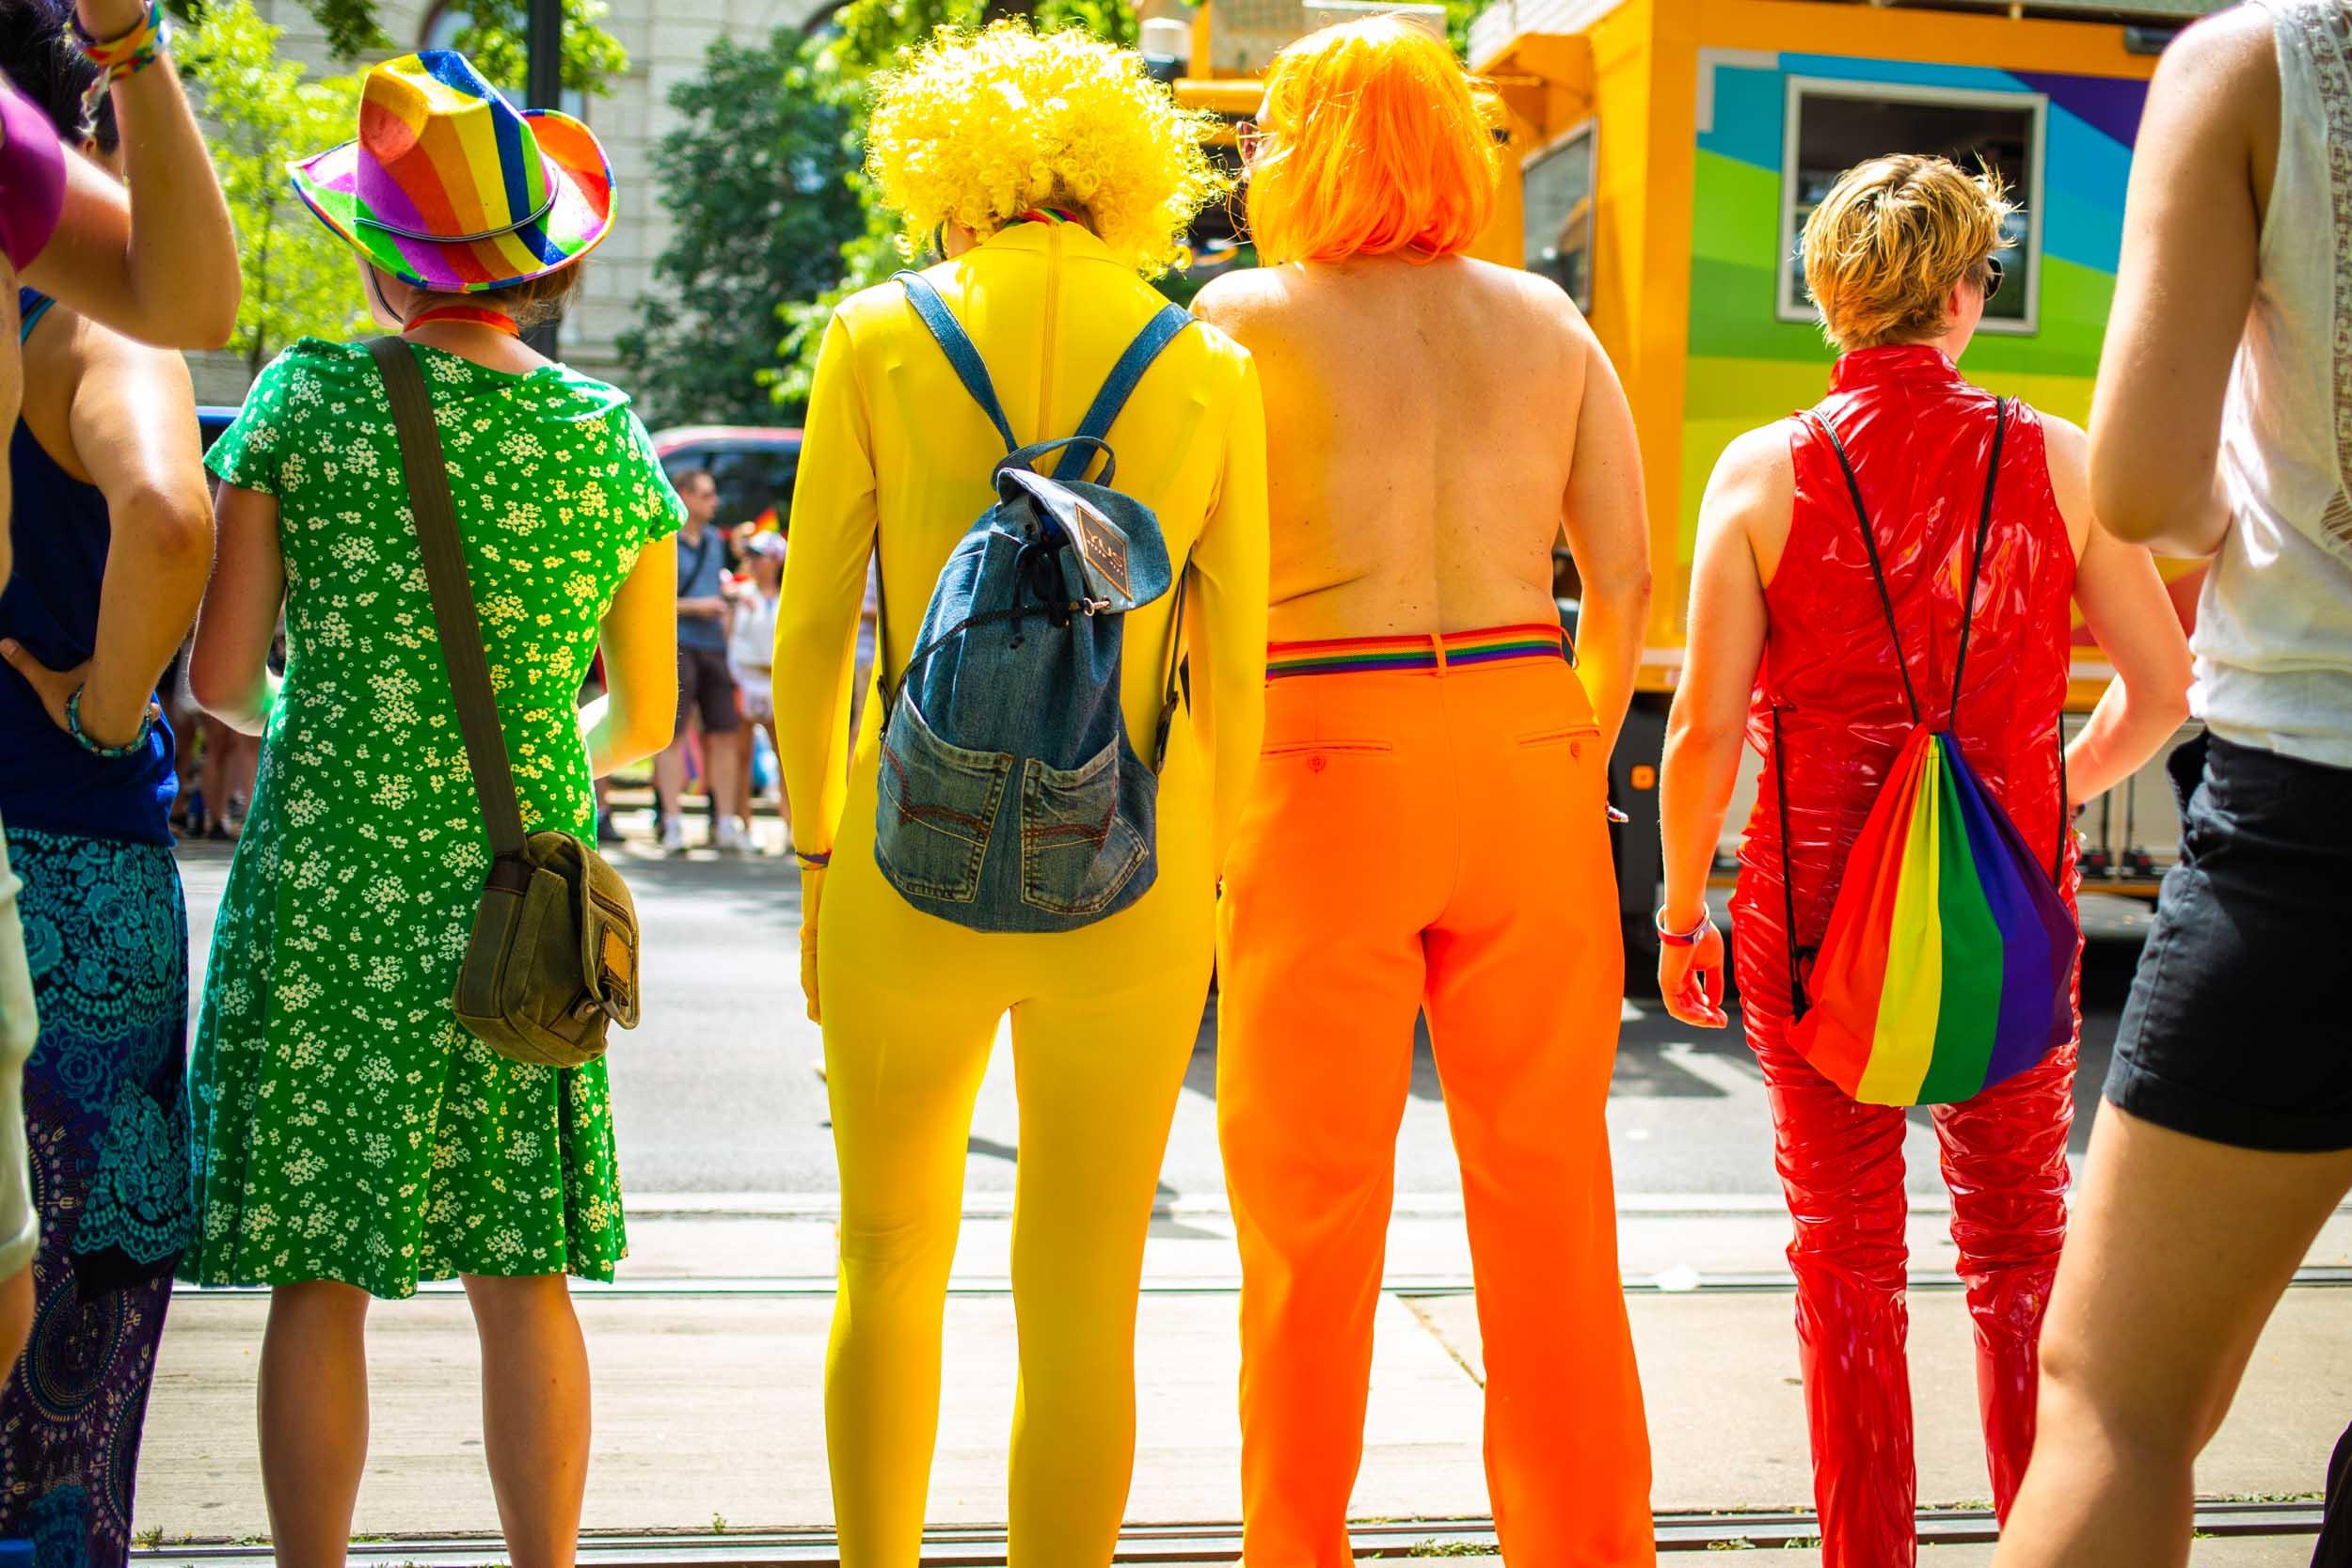 Rainbow People © Michael Goldrei 2019